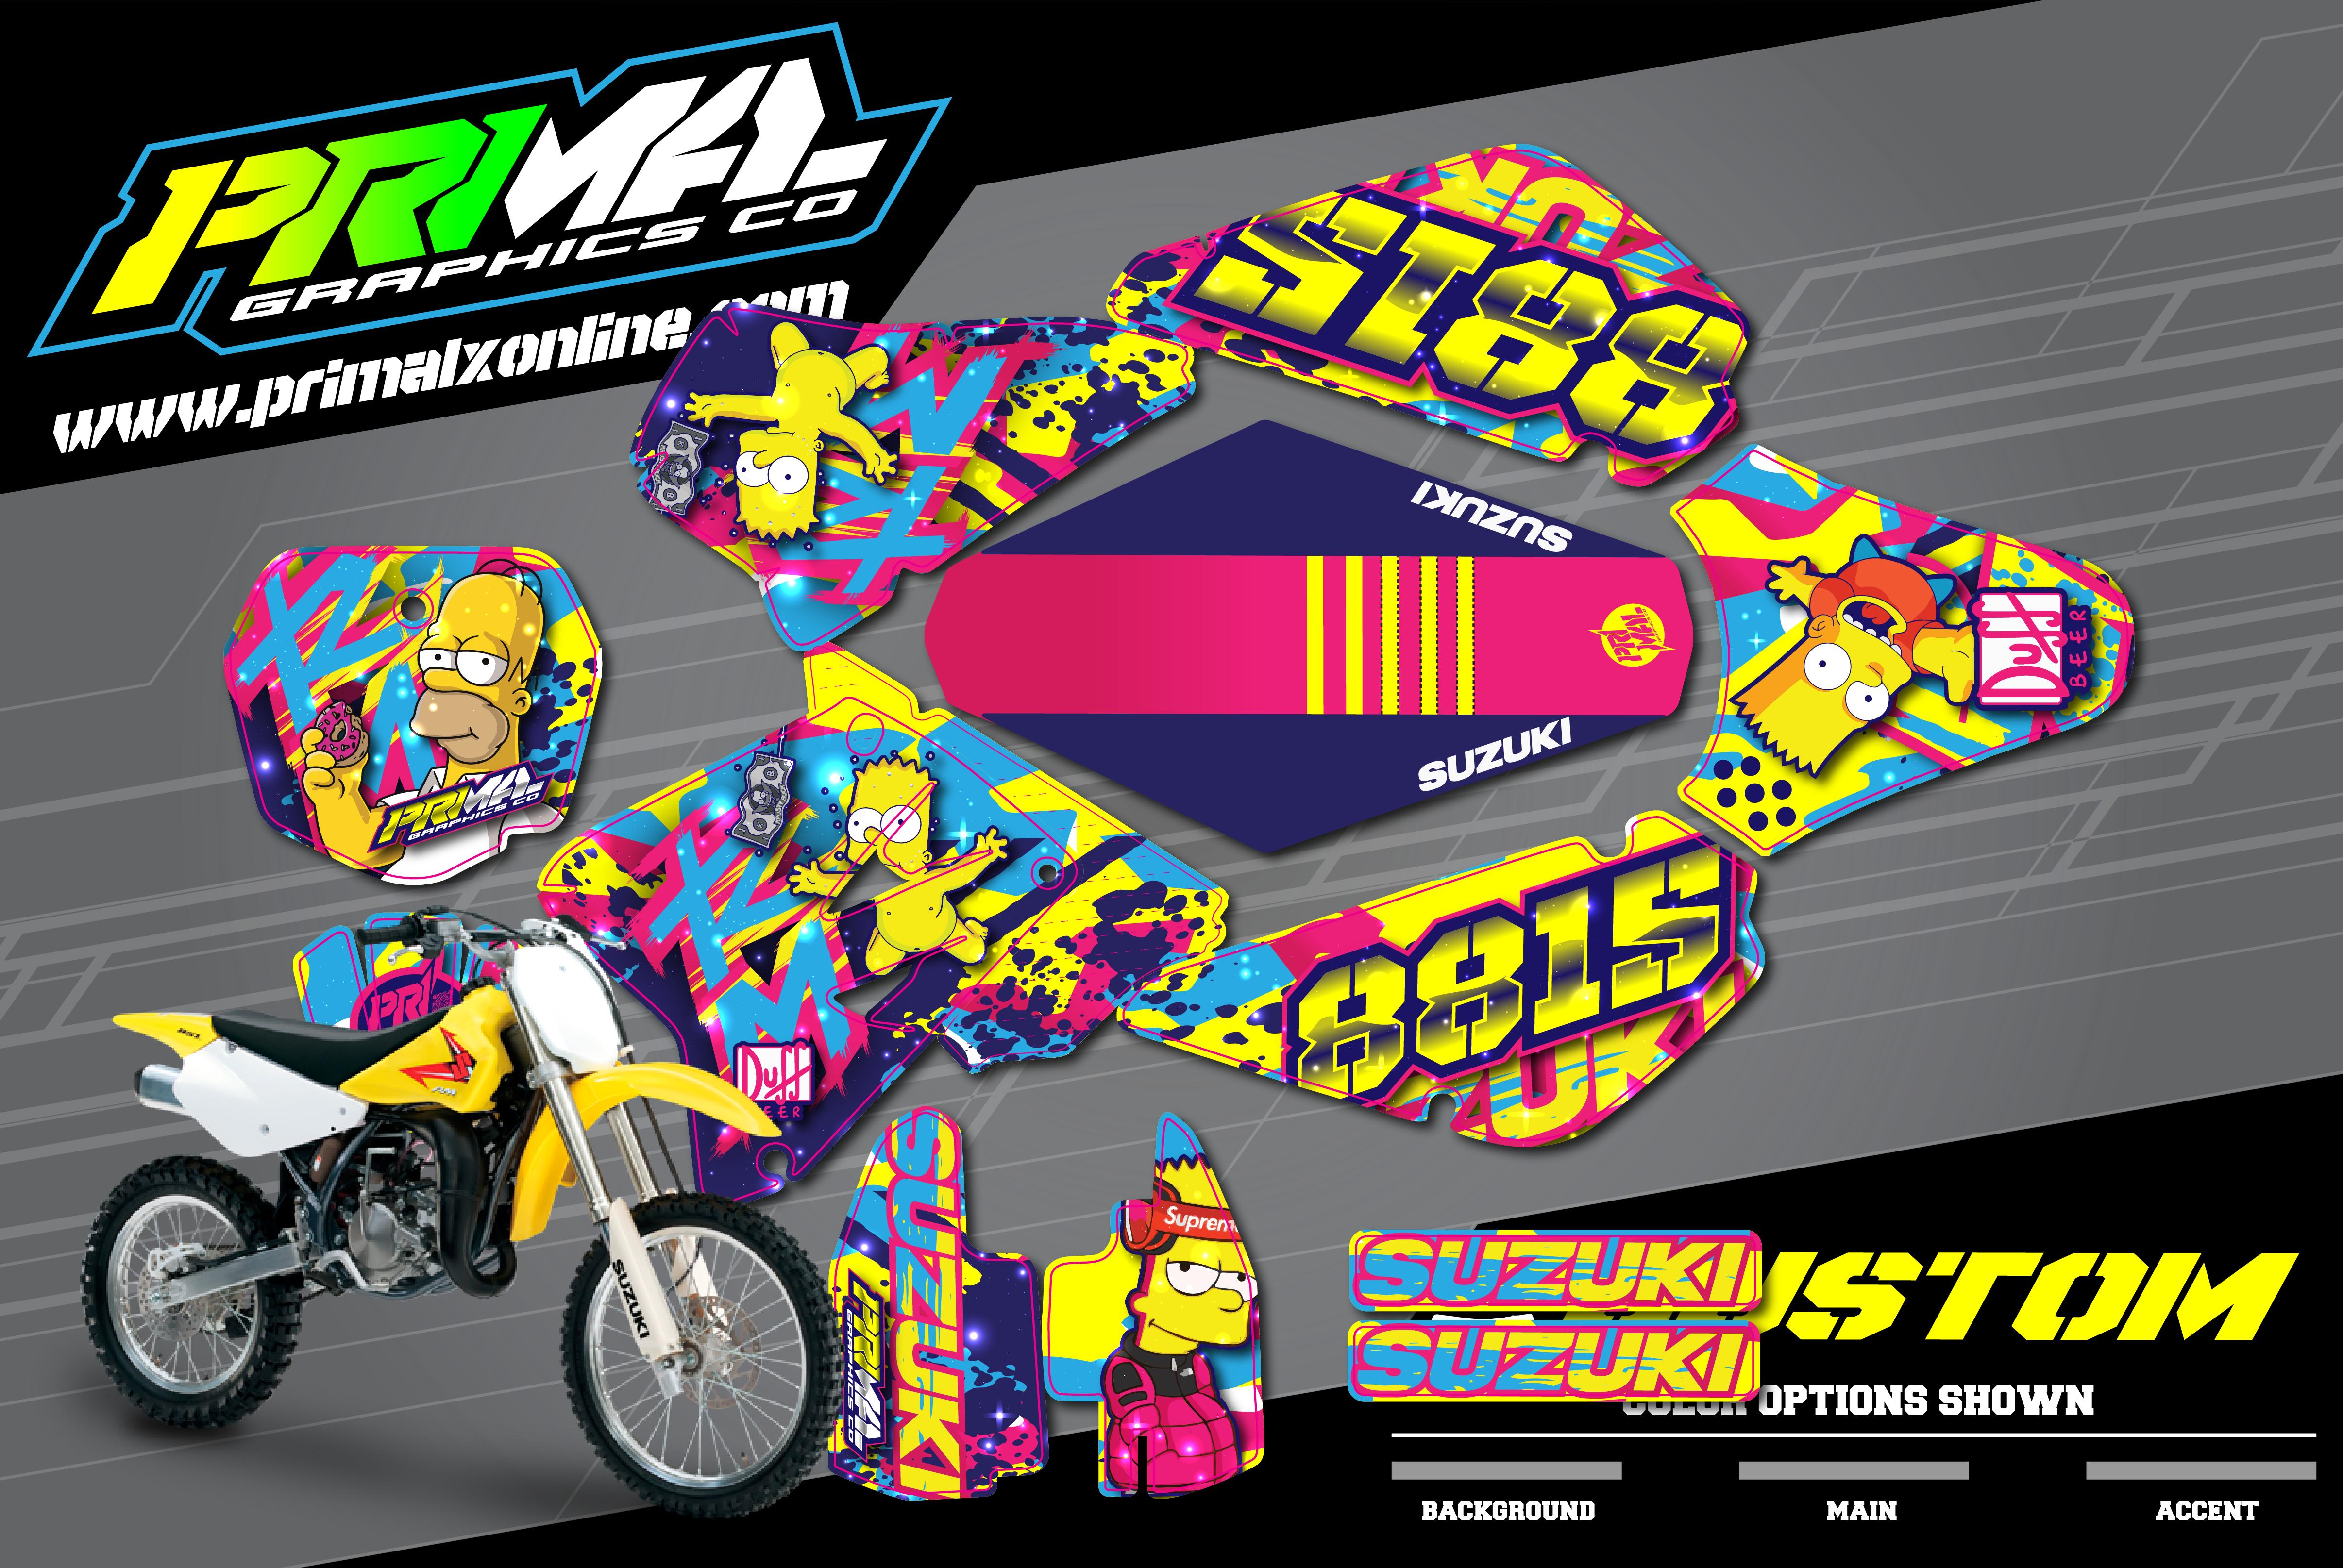 PRIMAL-X-MOTORSPORTS-PRIMAL-GRAPHICS-CO-SUZUKI-RM80-RM85-RM100-SUPERMOTO-MOTOCROSS-GRAPHICS-BIKELIFE-CHARMCITY-KINGS-01